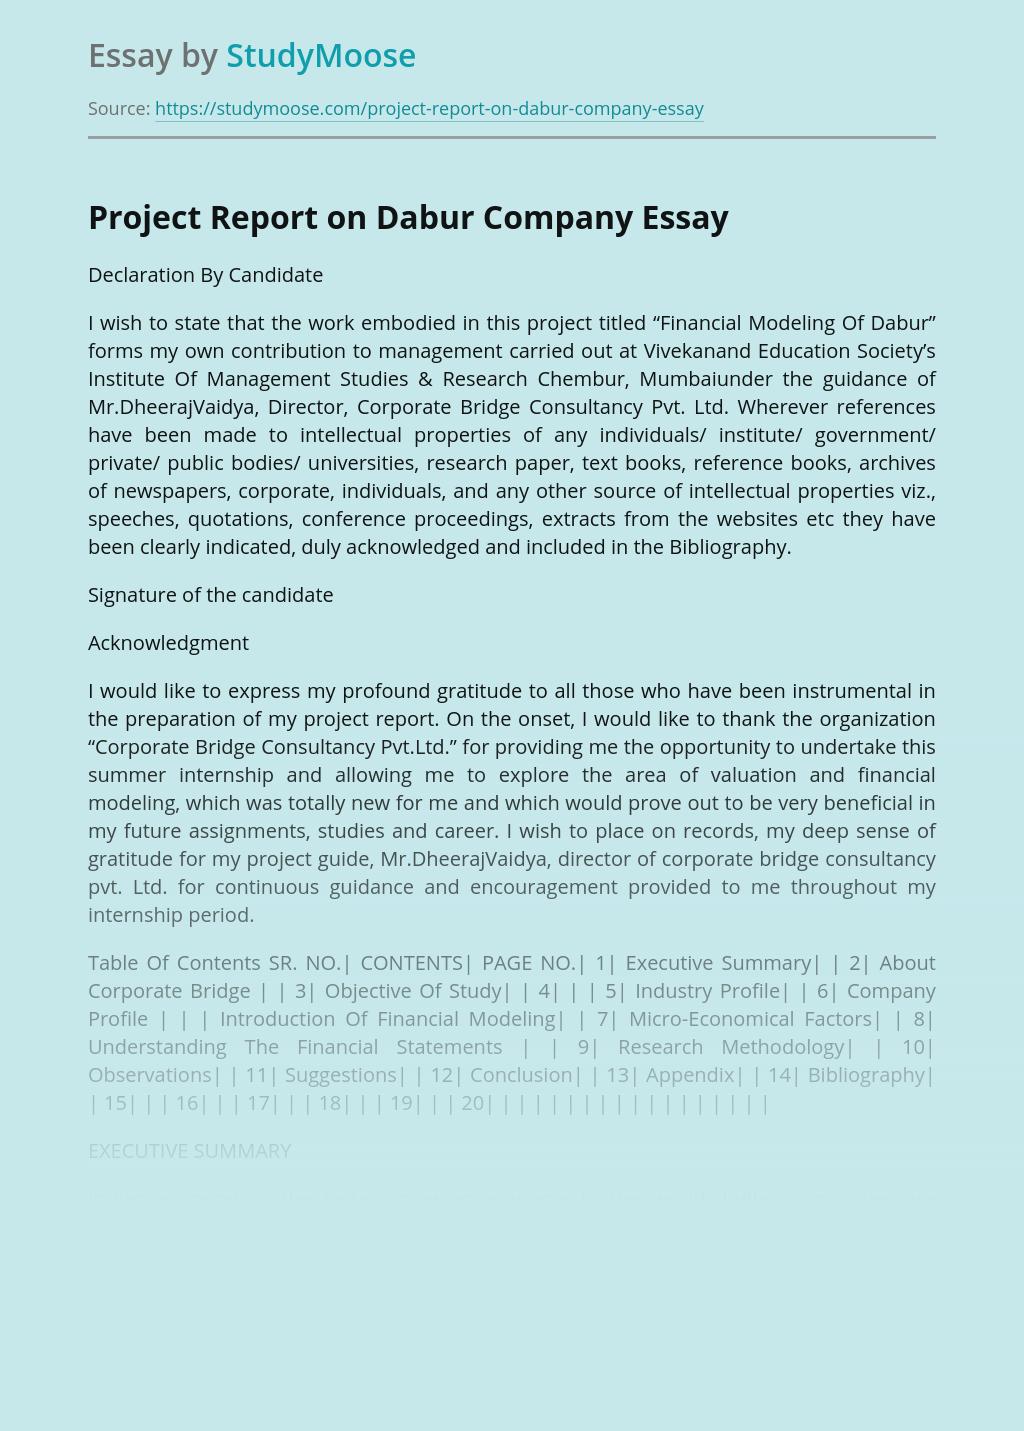 Project Report on Dabur Company